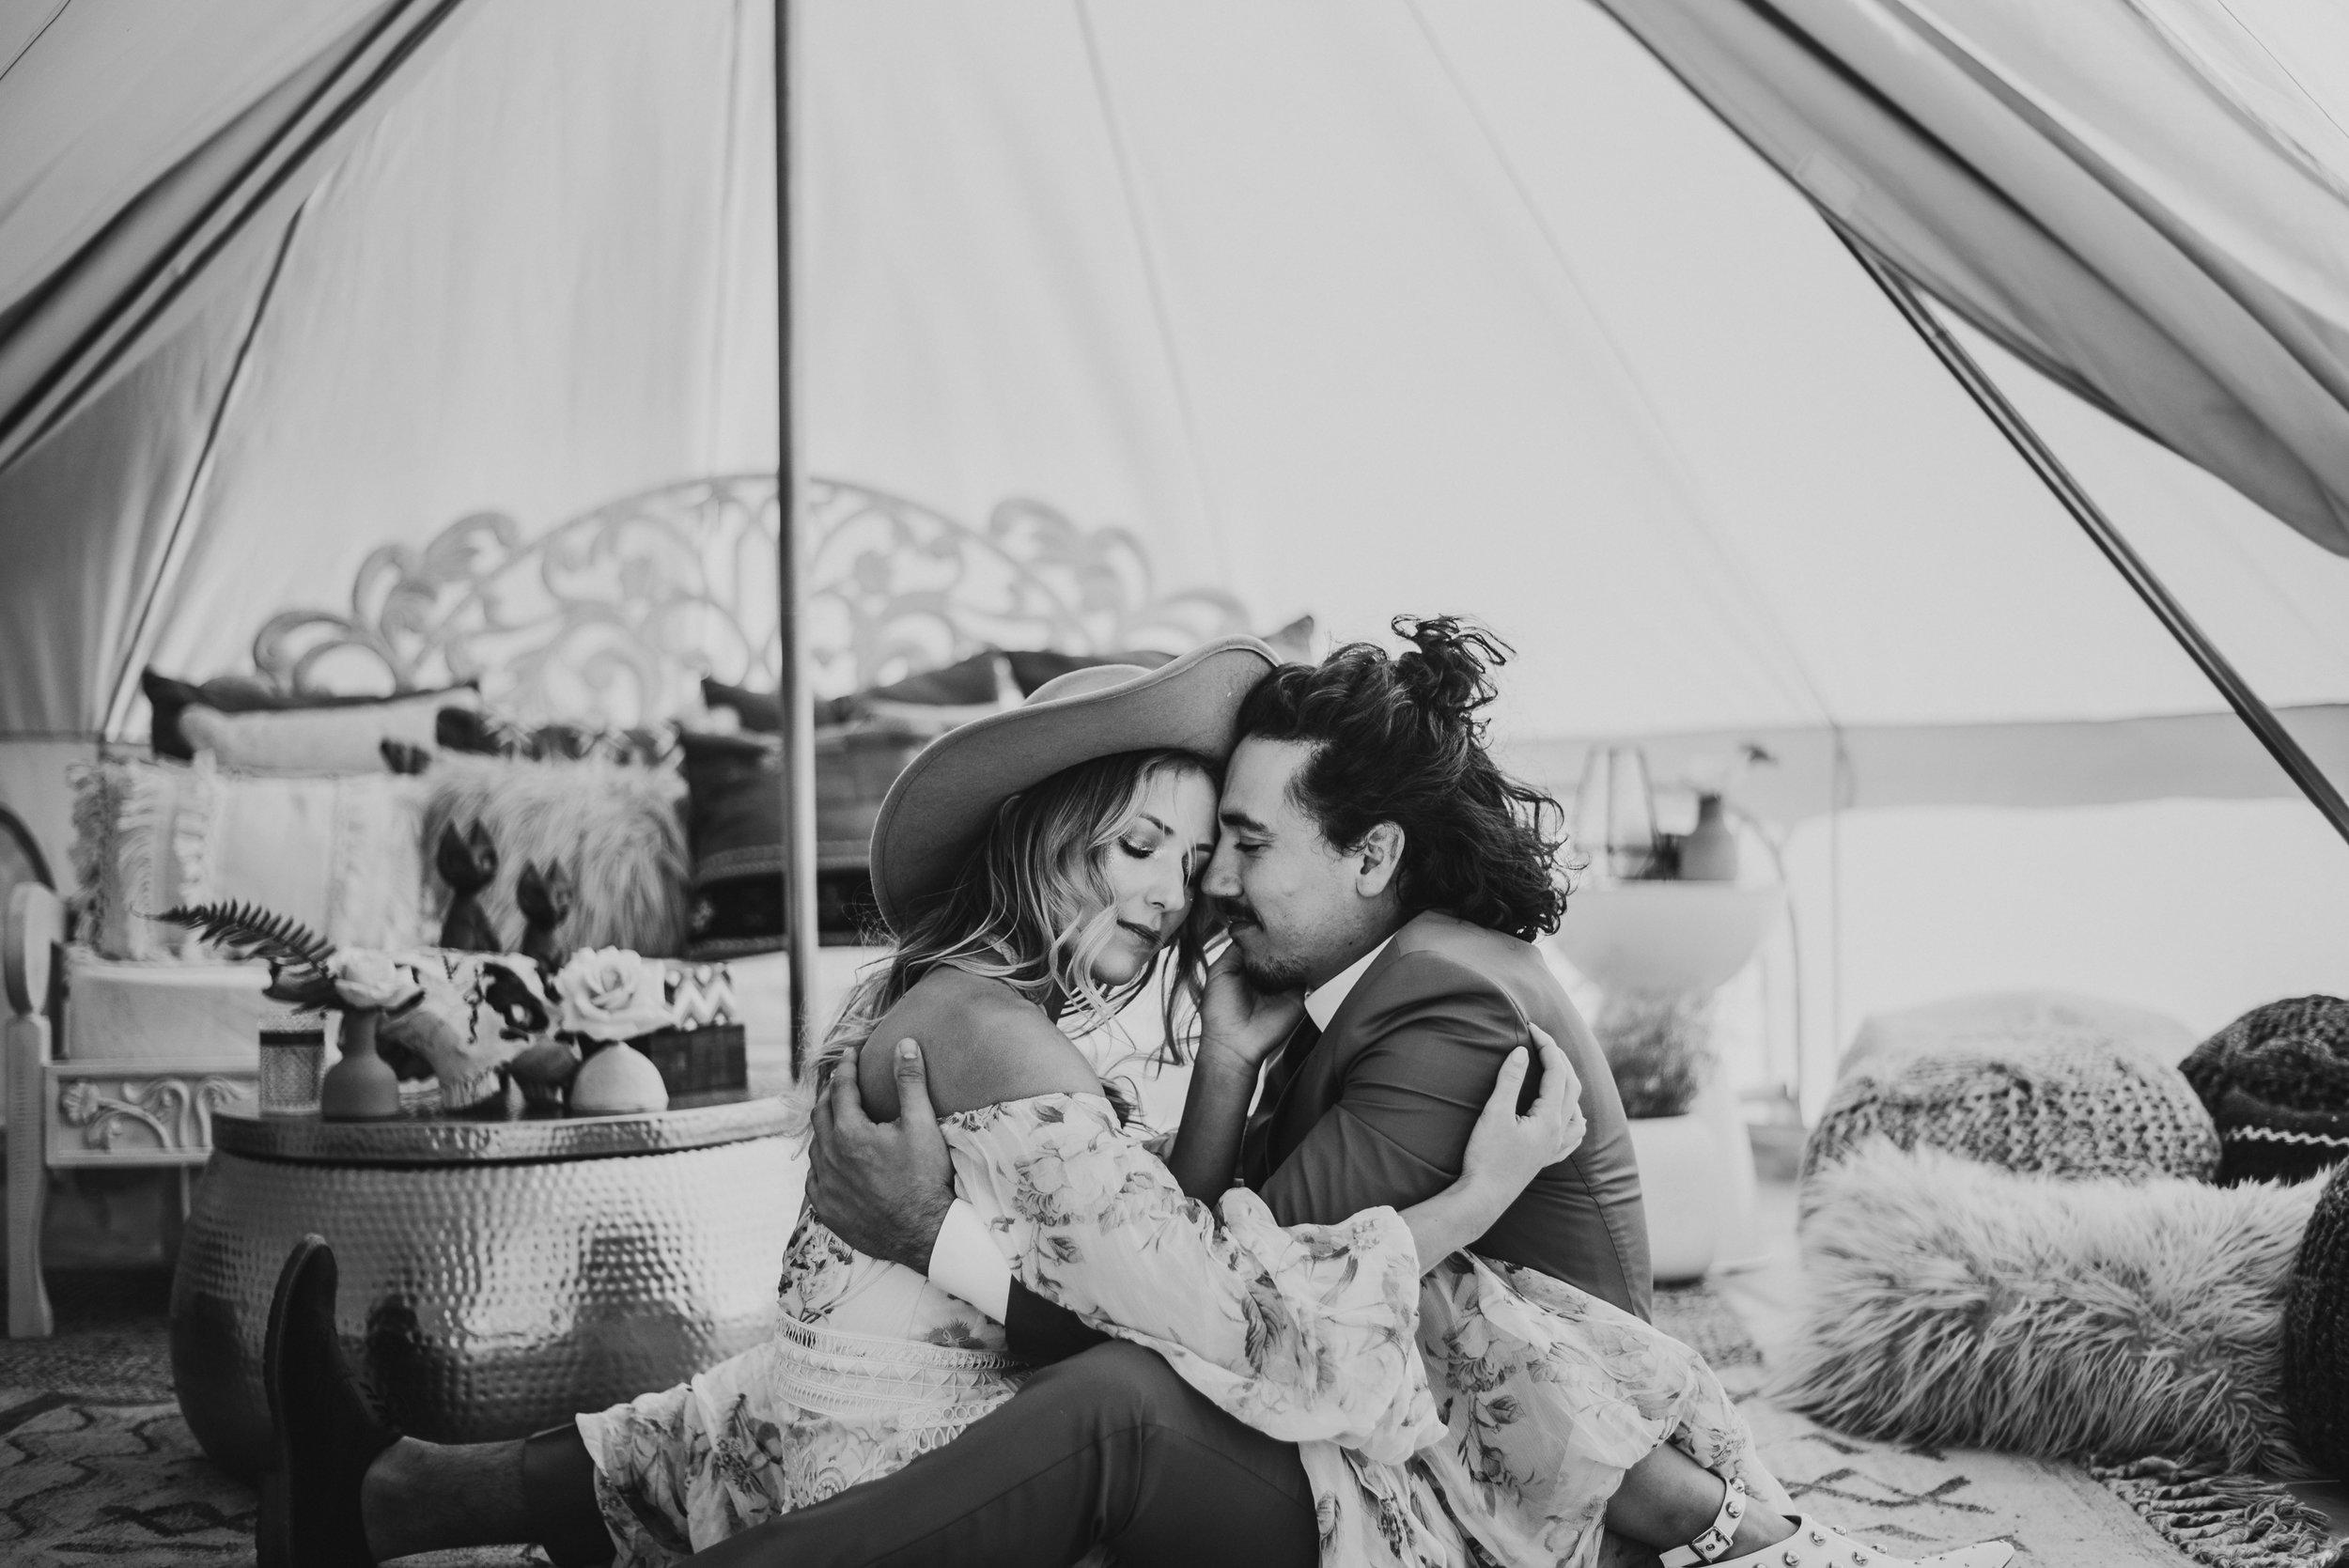 FortSt.John_photographer_TyraEPhotography_Wedding_Couple_Family_Photograhy_DawsonCreek_Elopement_Bride_Boduoir_Portraits-7201.jpg